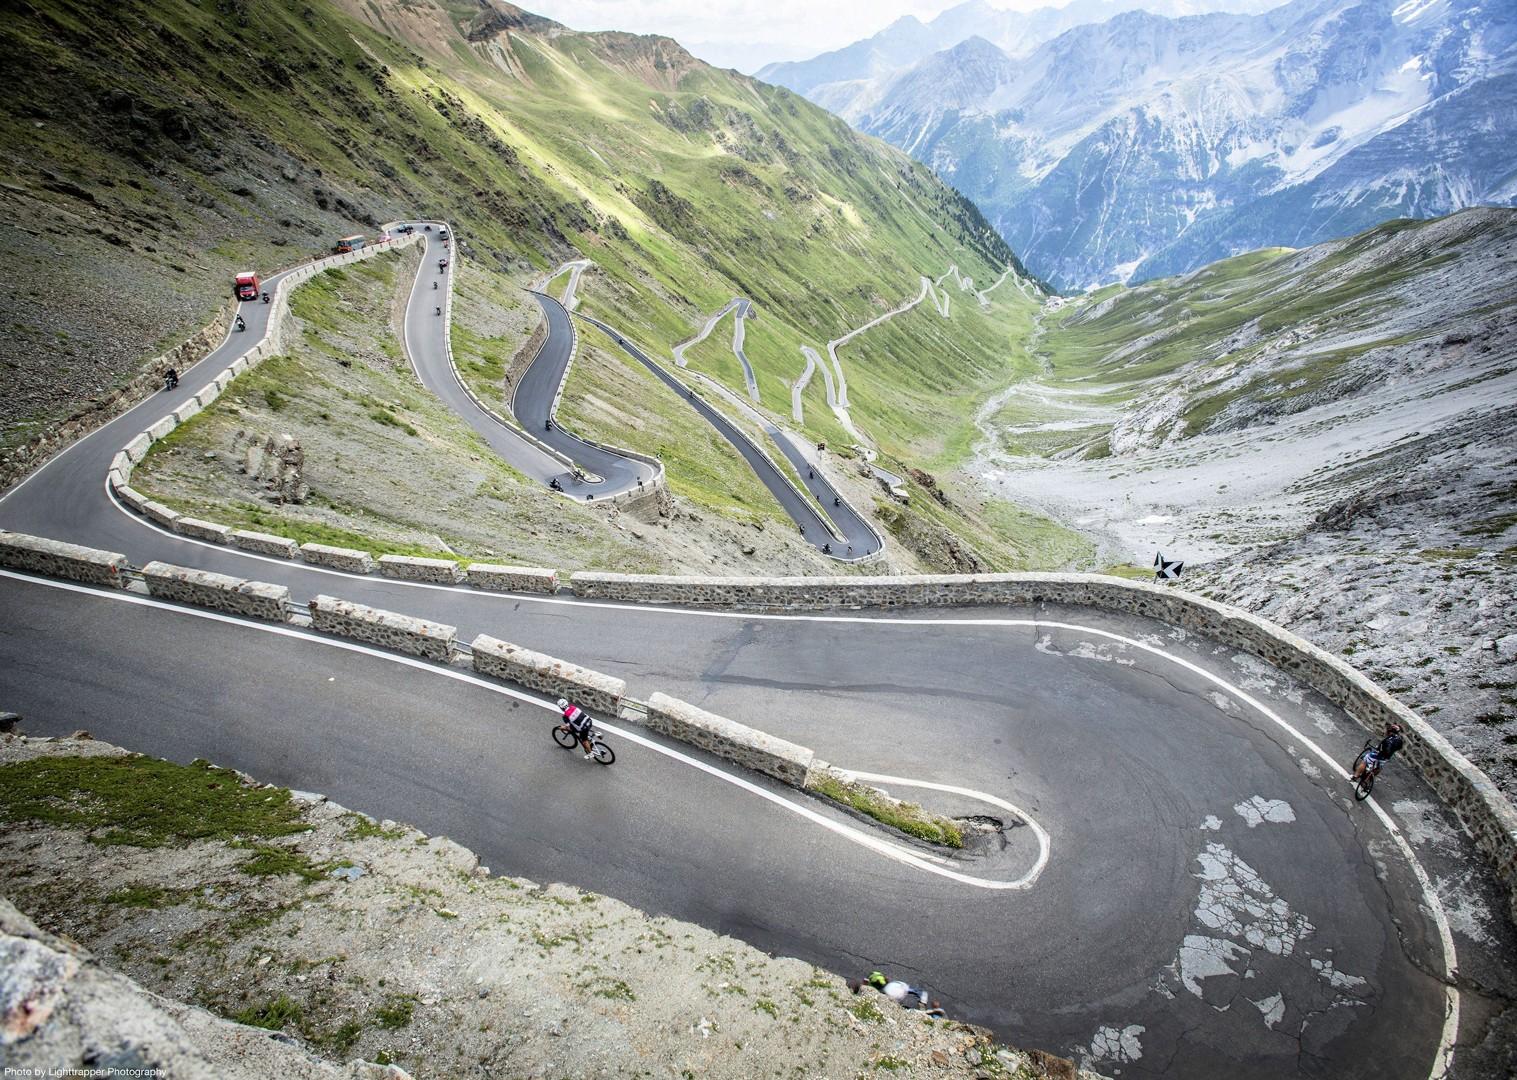 stelvio-guided-road-cycling-holiday.jpg - Italy - Italian Alps - Guided Road Cycling Holiday - Road Cycling